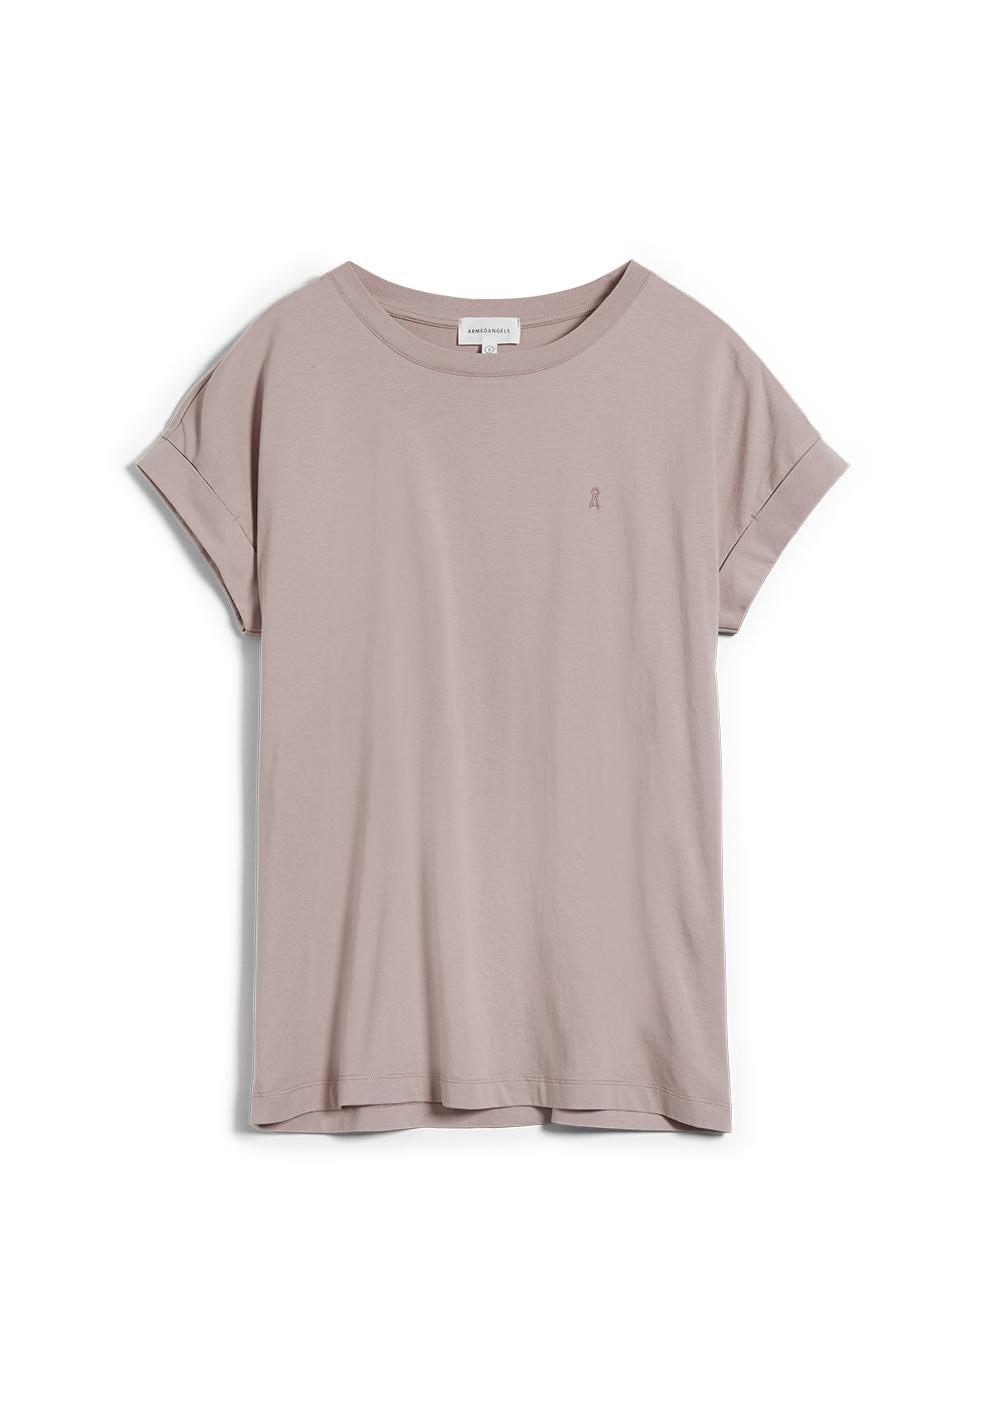 IDAA T-Shirt made of Organic Cotton